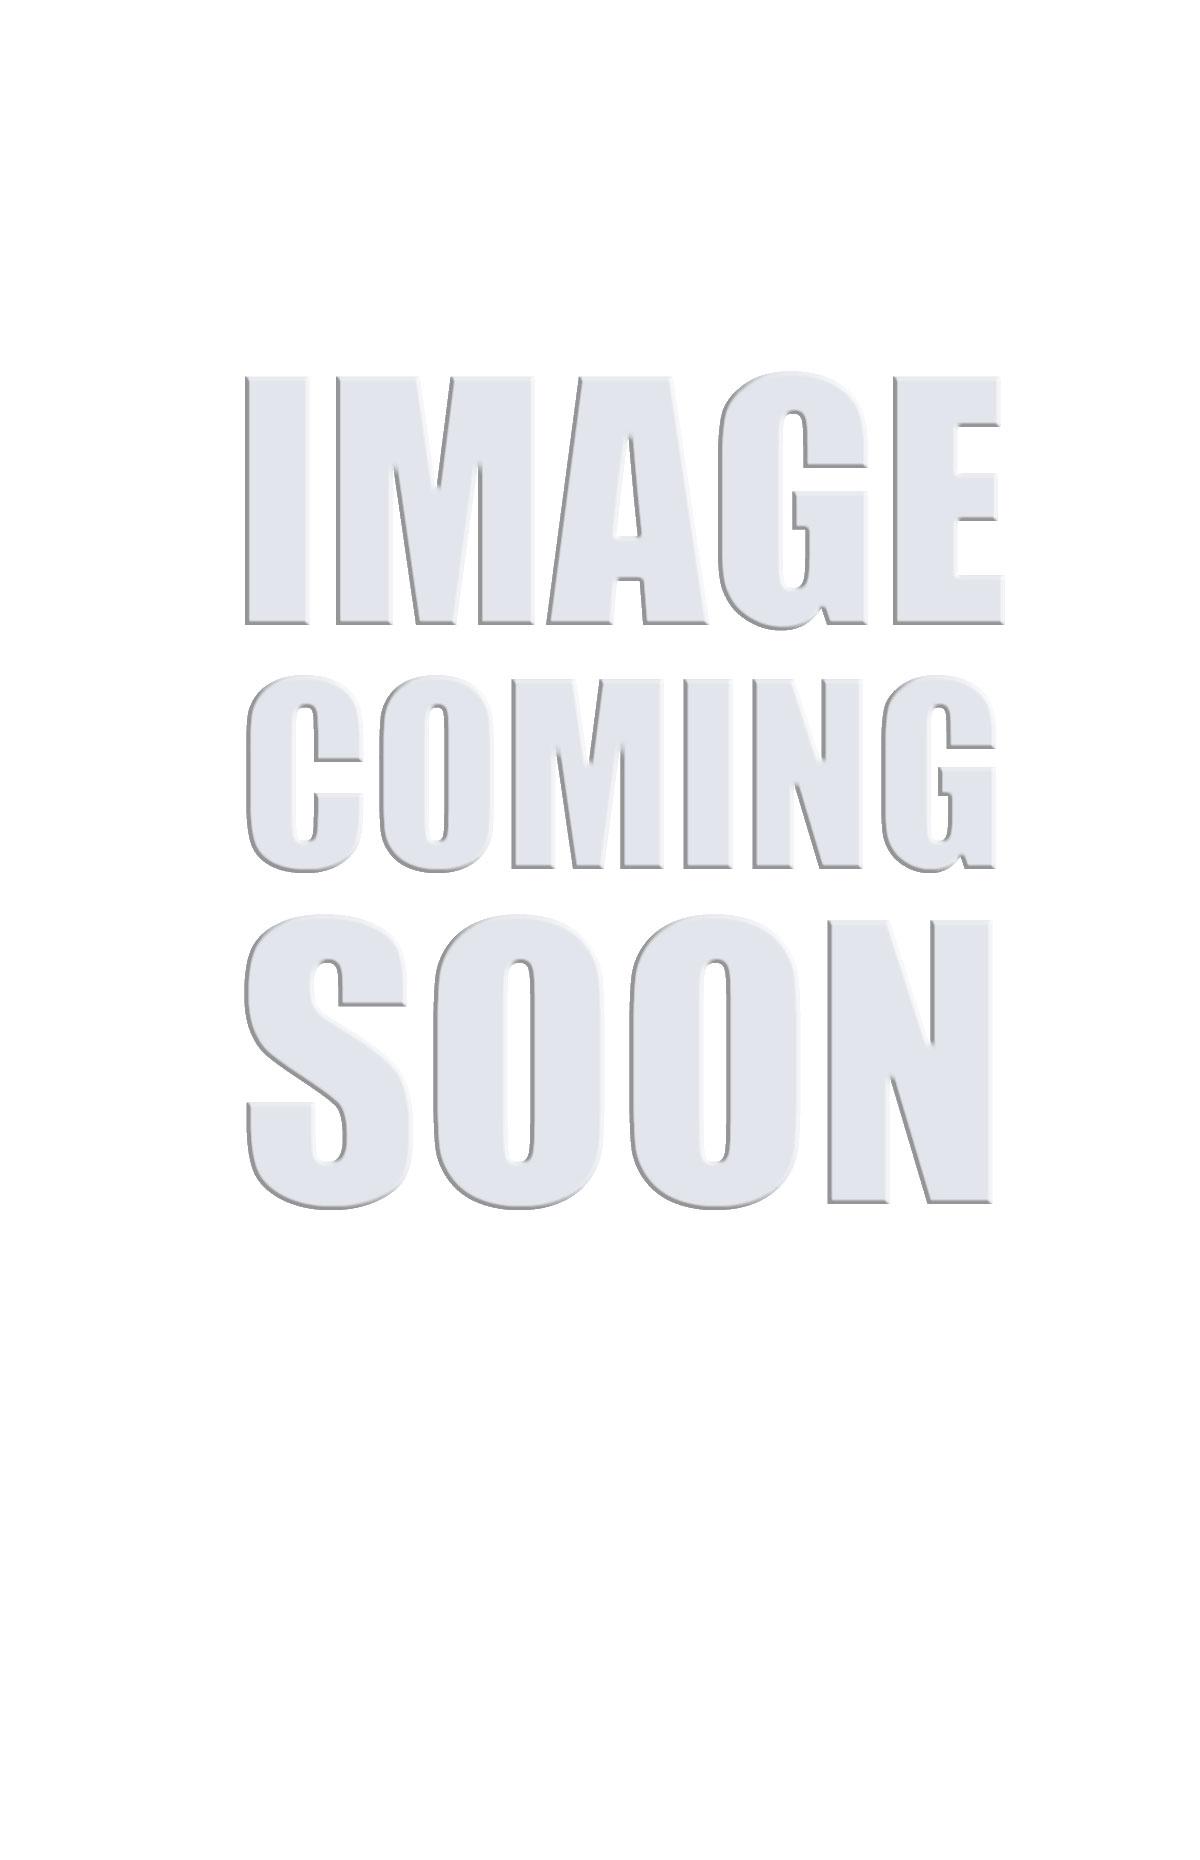 MOTOR 119412-00 WAS 116392-01